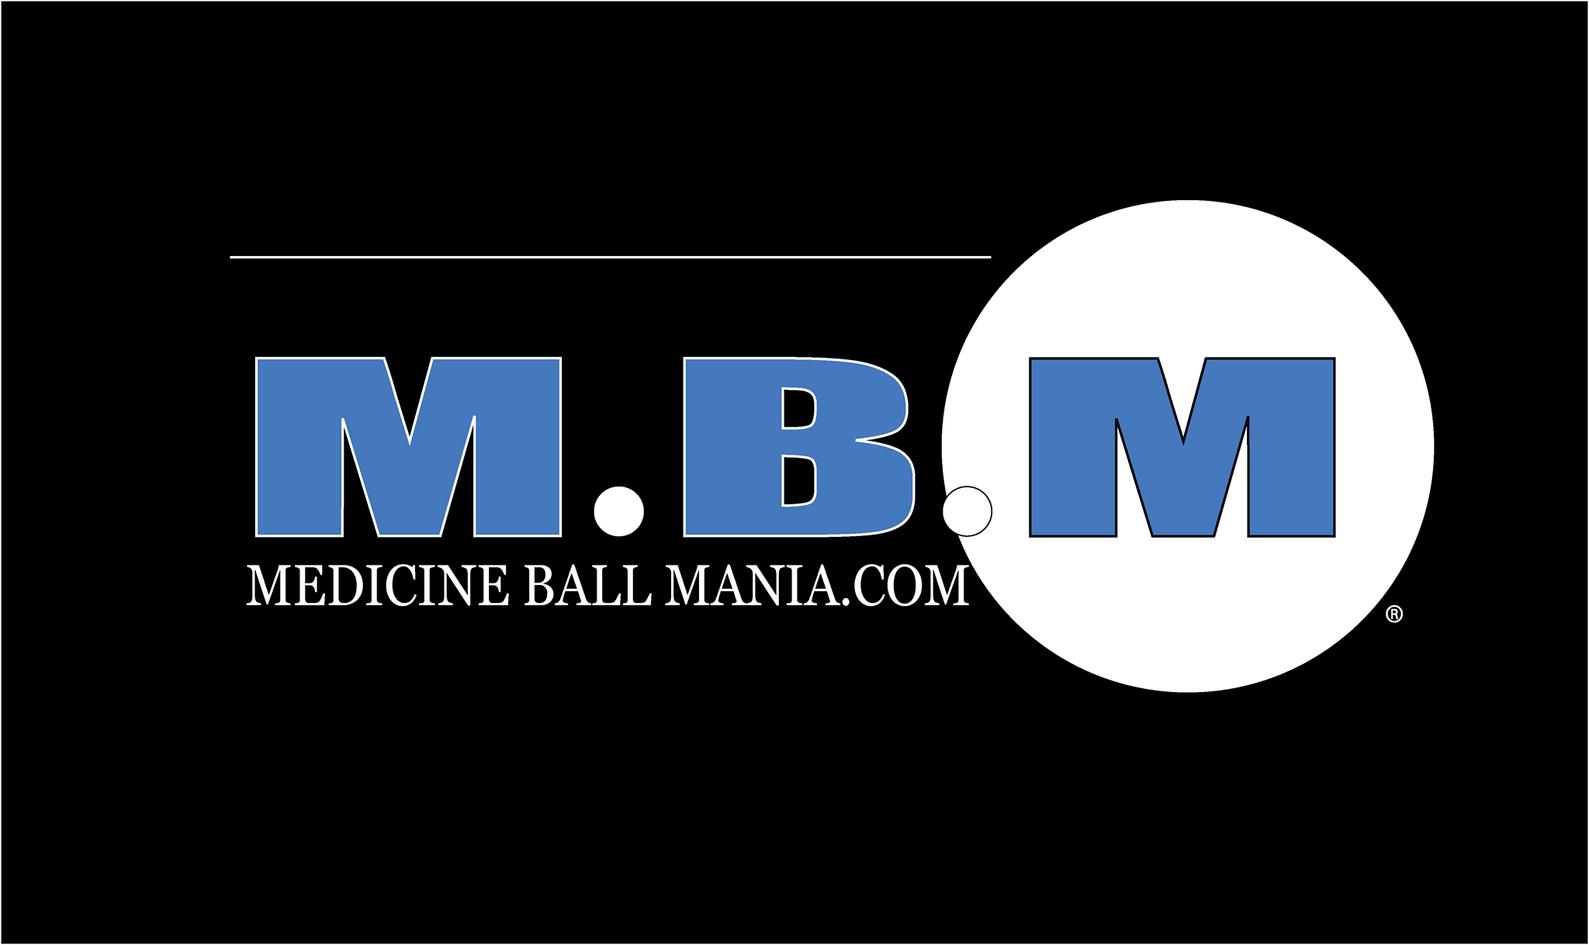 Medicine Ball Mania